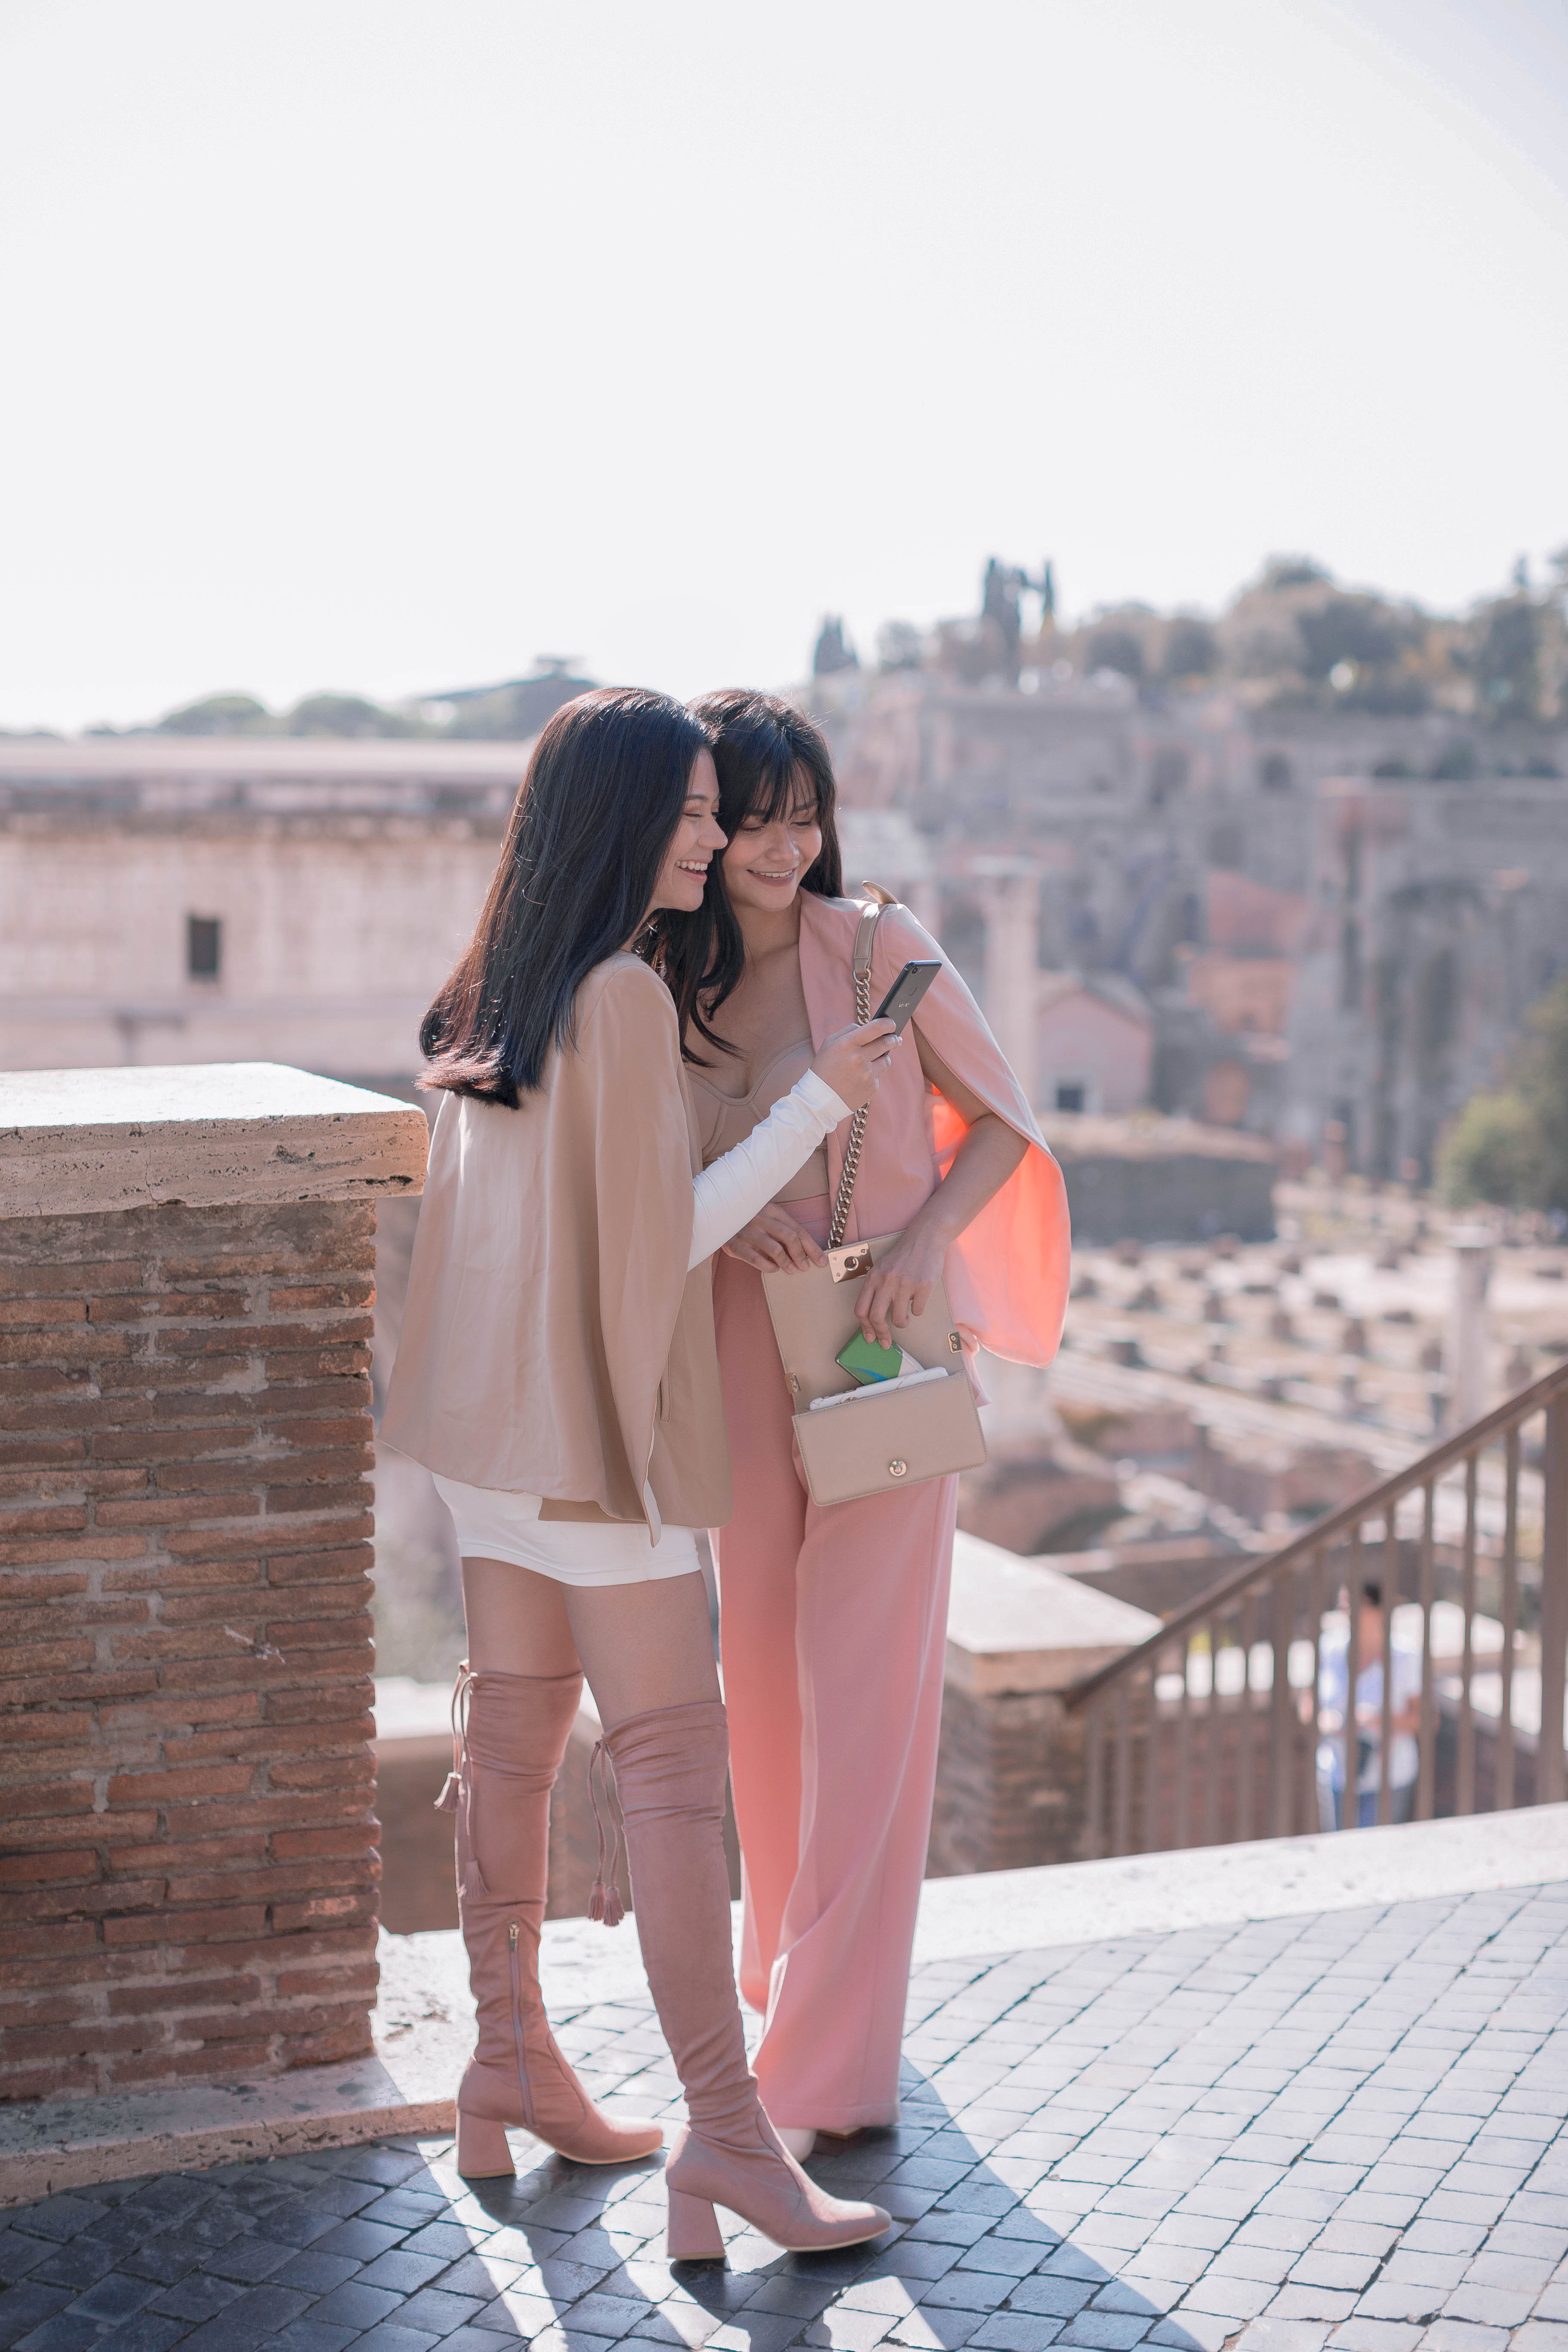 vernica_enciso-rome-s1_79 copy